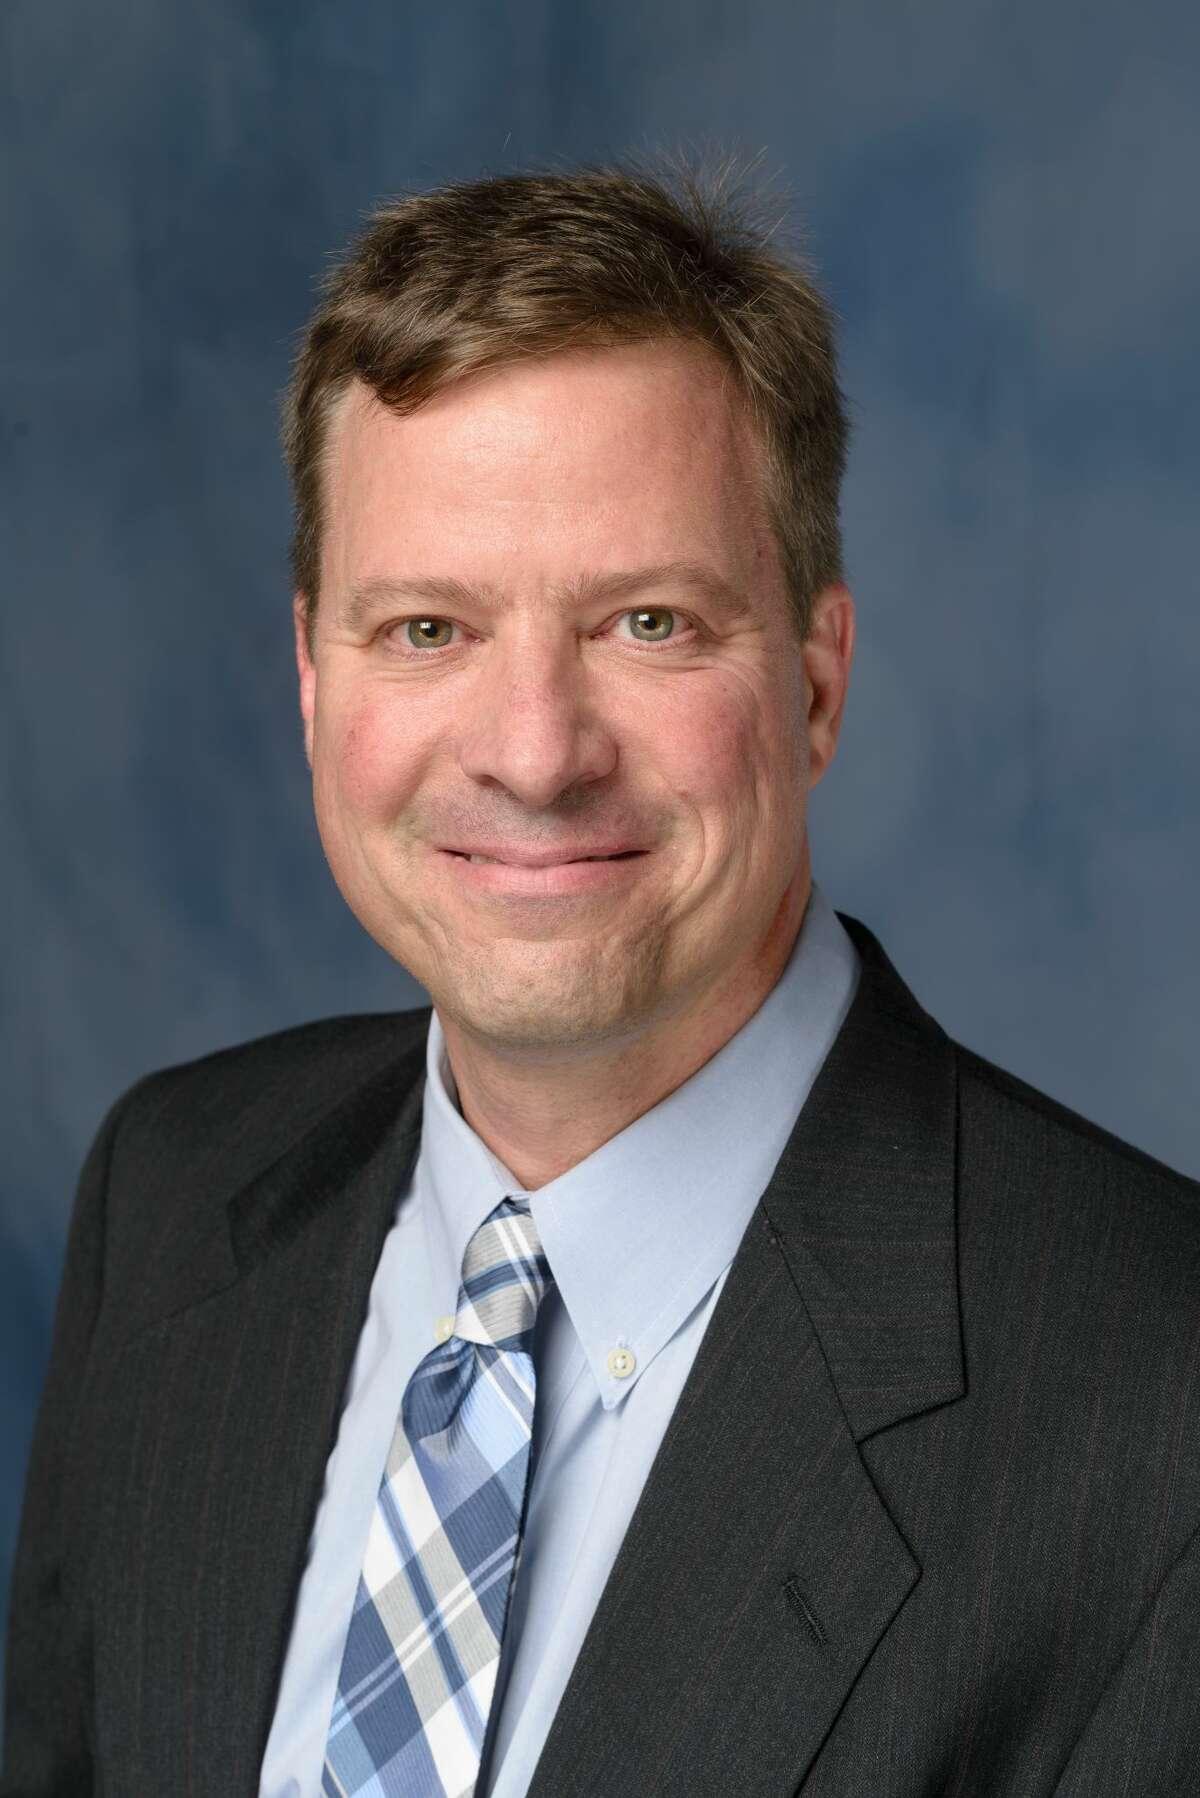 Lance McMahon, PhD, Chair and Professor of Pharmacodynamics